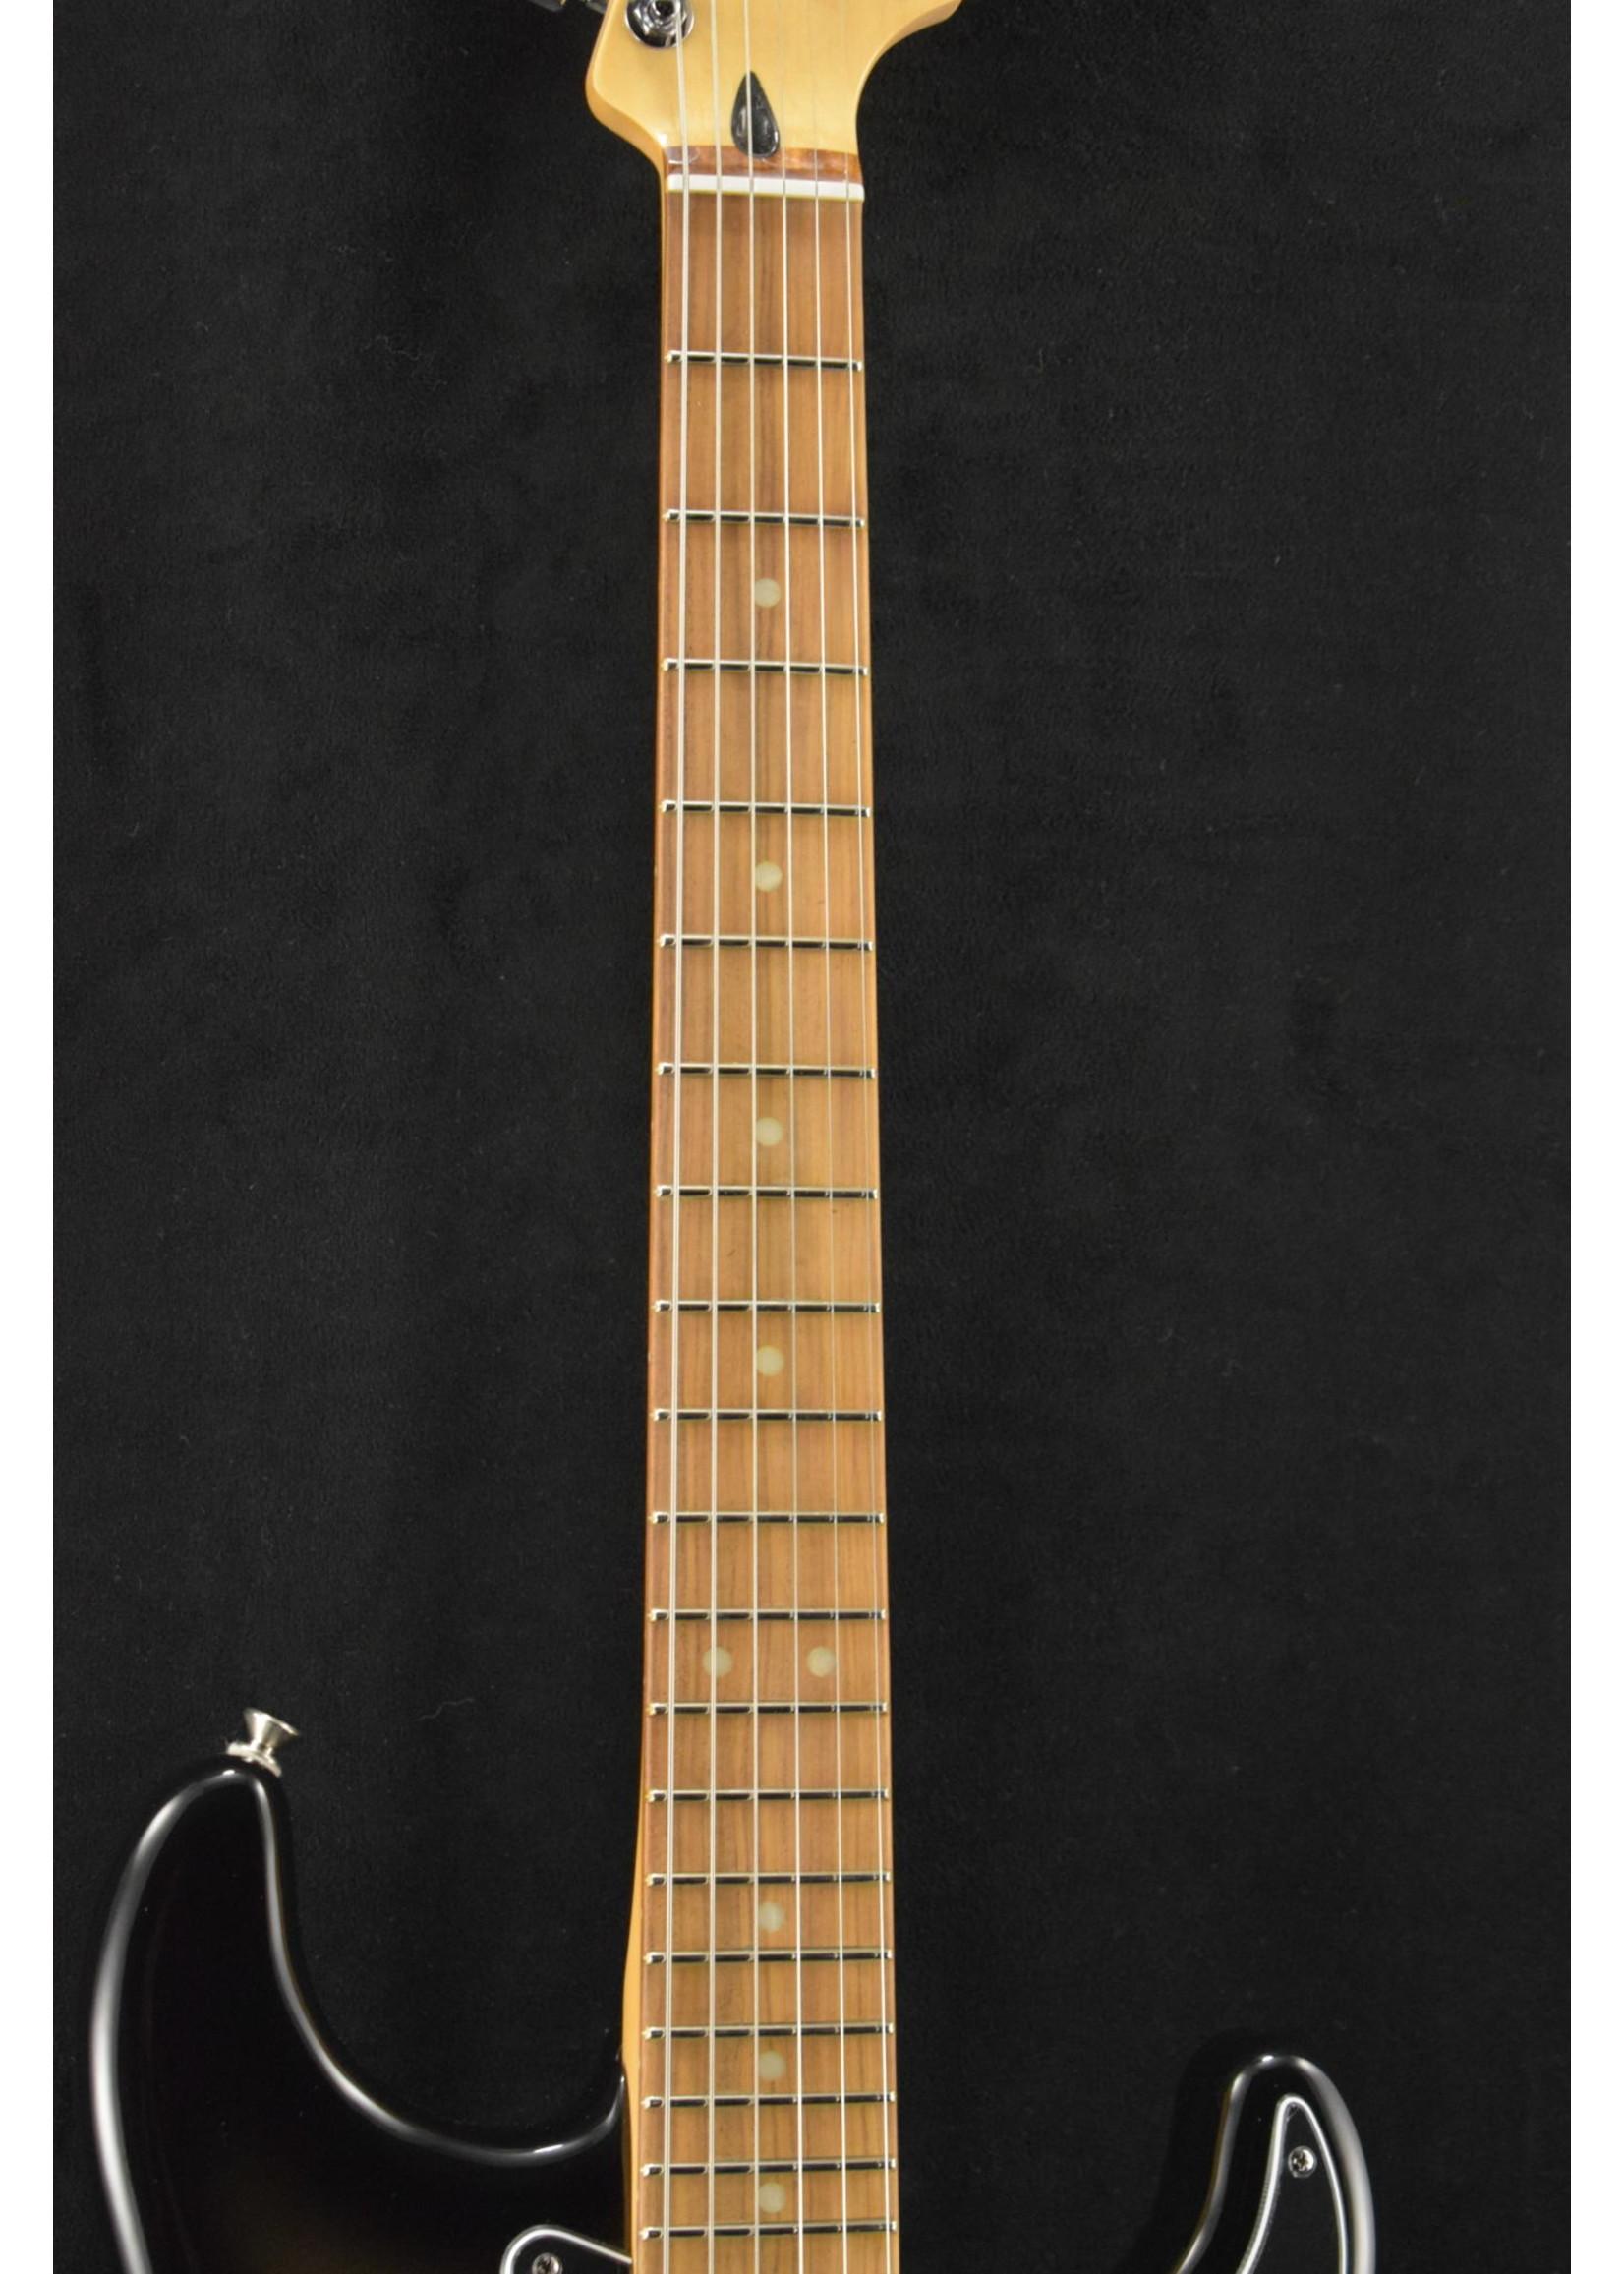 Fender Fender Player Plus Stratocaster HSS Pau Ferro Fingerboard Silverburst